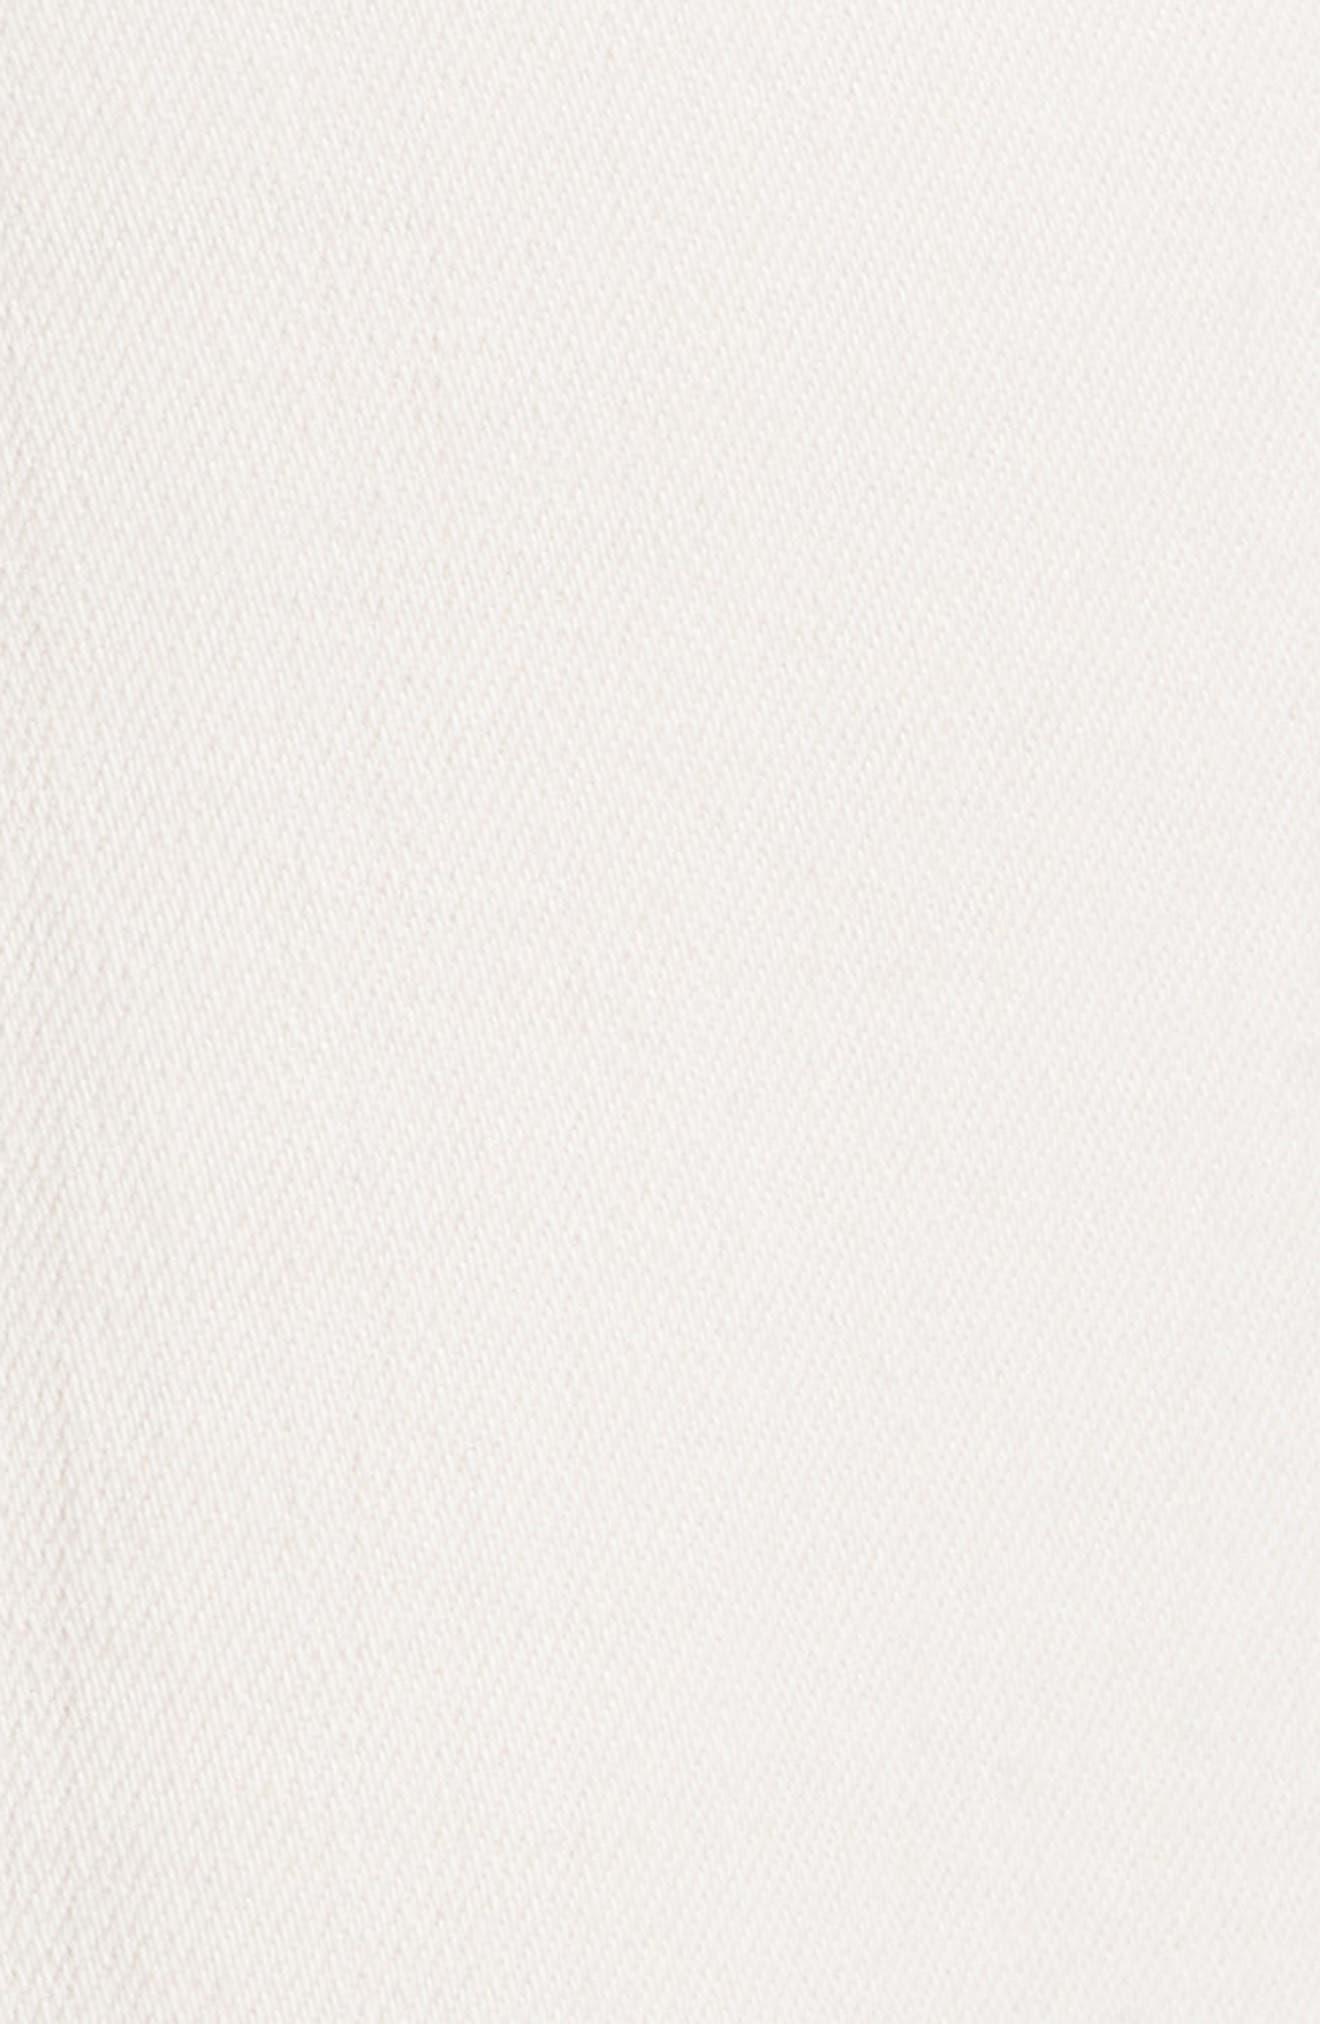 Audrina Ripped Straight Leg Crop Jeans,                             Alternate thumbnail 5, color,                             Quartz Worn Destruct